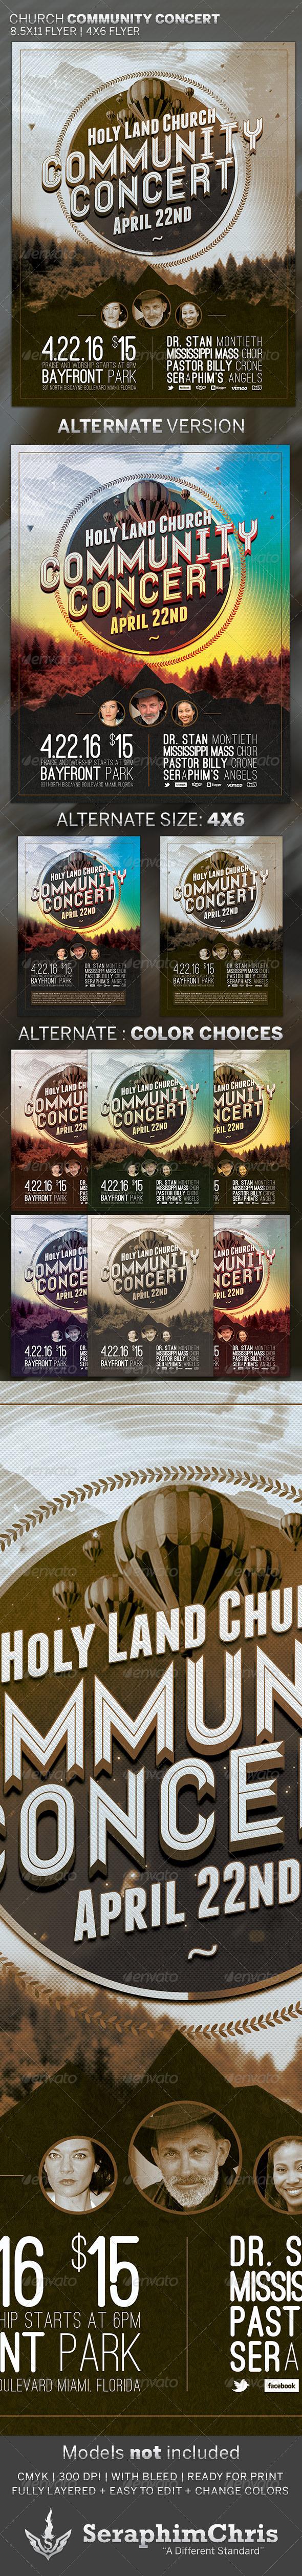 Church Community Concert: Flyer Template - Church Flyers